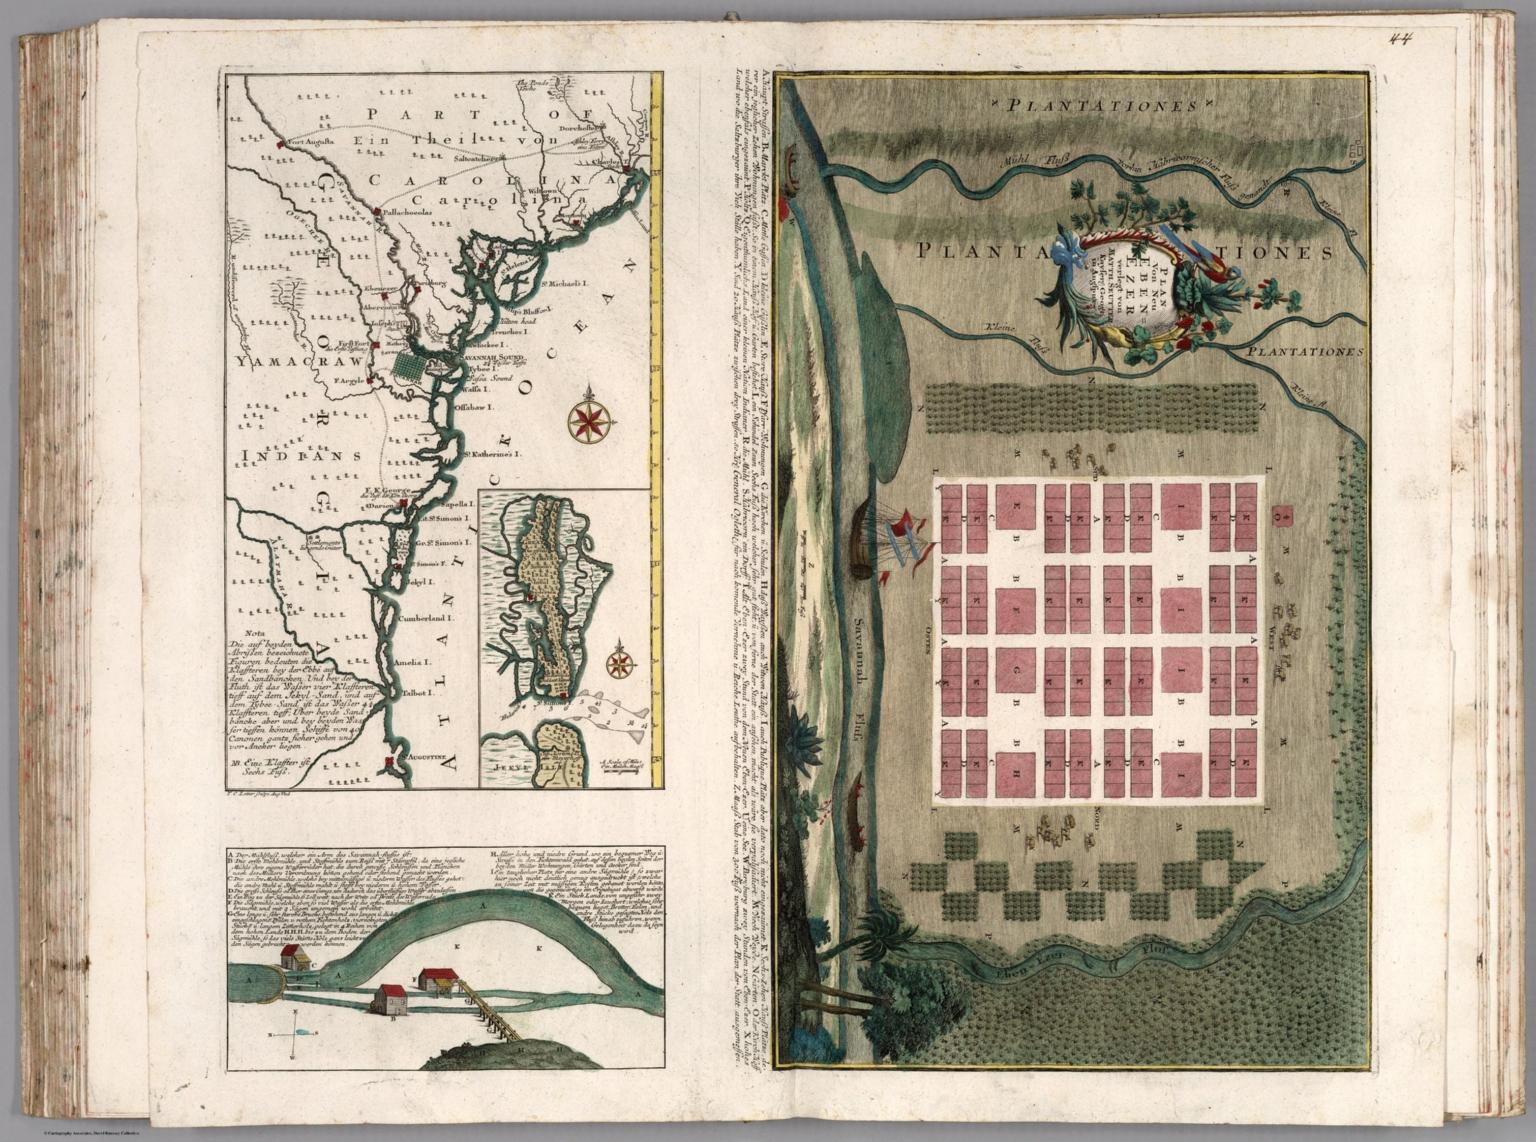 44. Composite: Plan von Neu Ebenezer (with) Coasts of South Carolina, Georgia, Florida. Savannah mills.